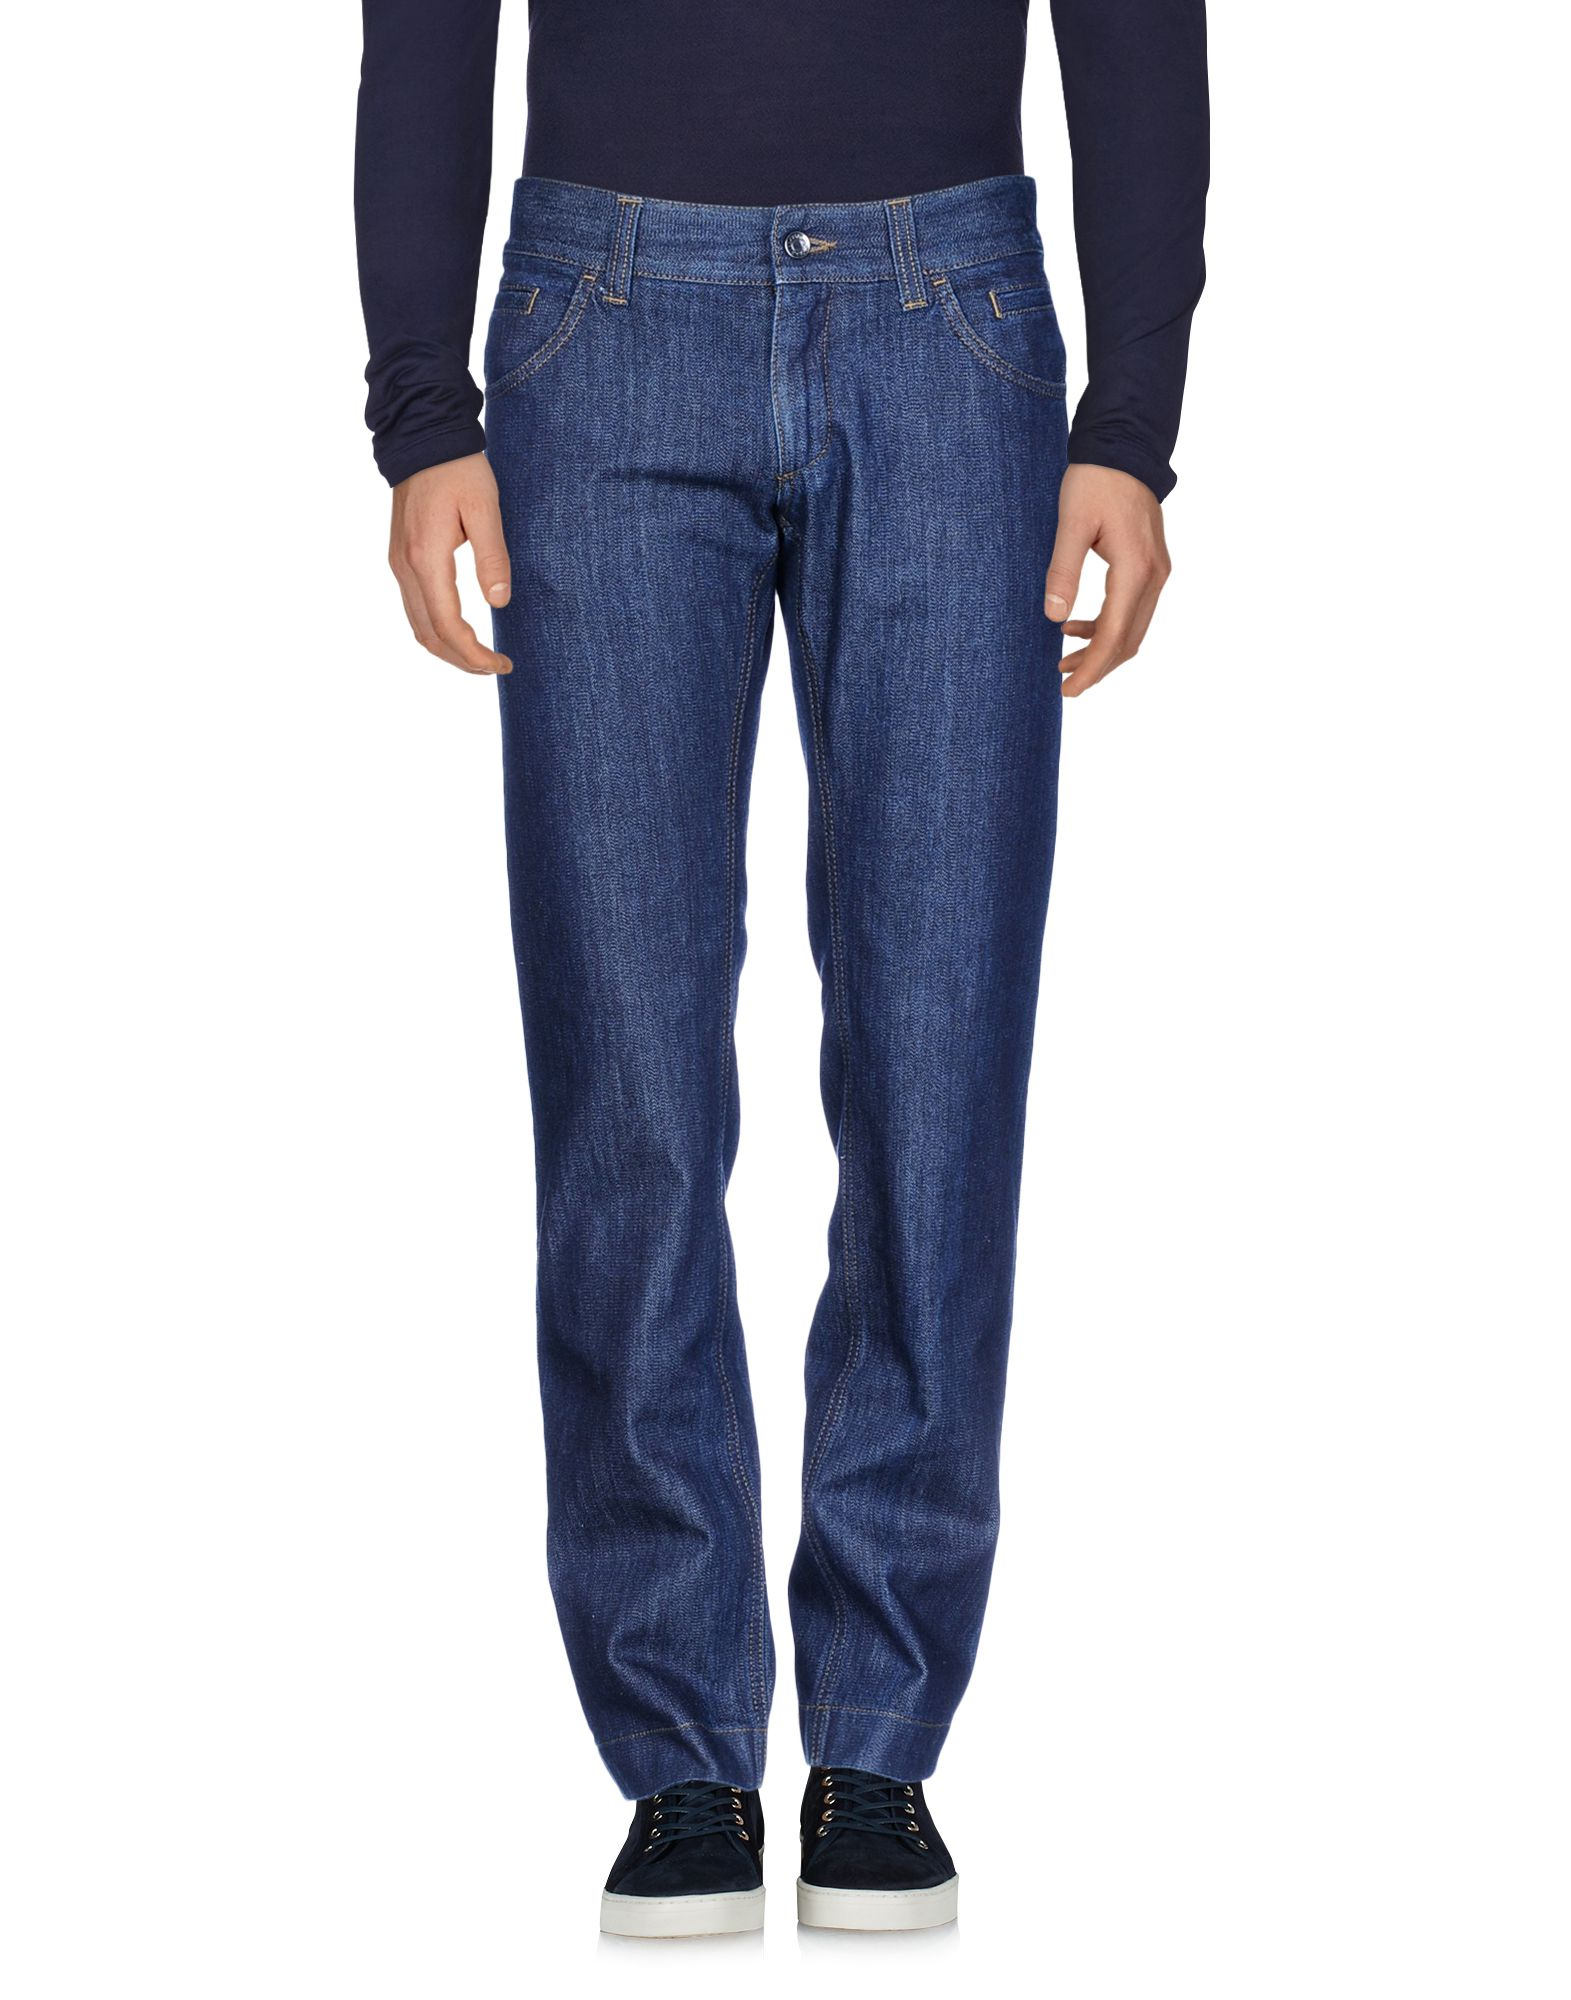 Pantaloni Gabbana Jeans Dolce & Gabbana Pantaloni Uomo - 42680225LE 0142cb